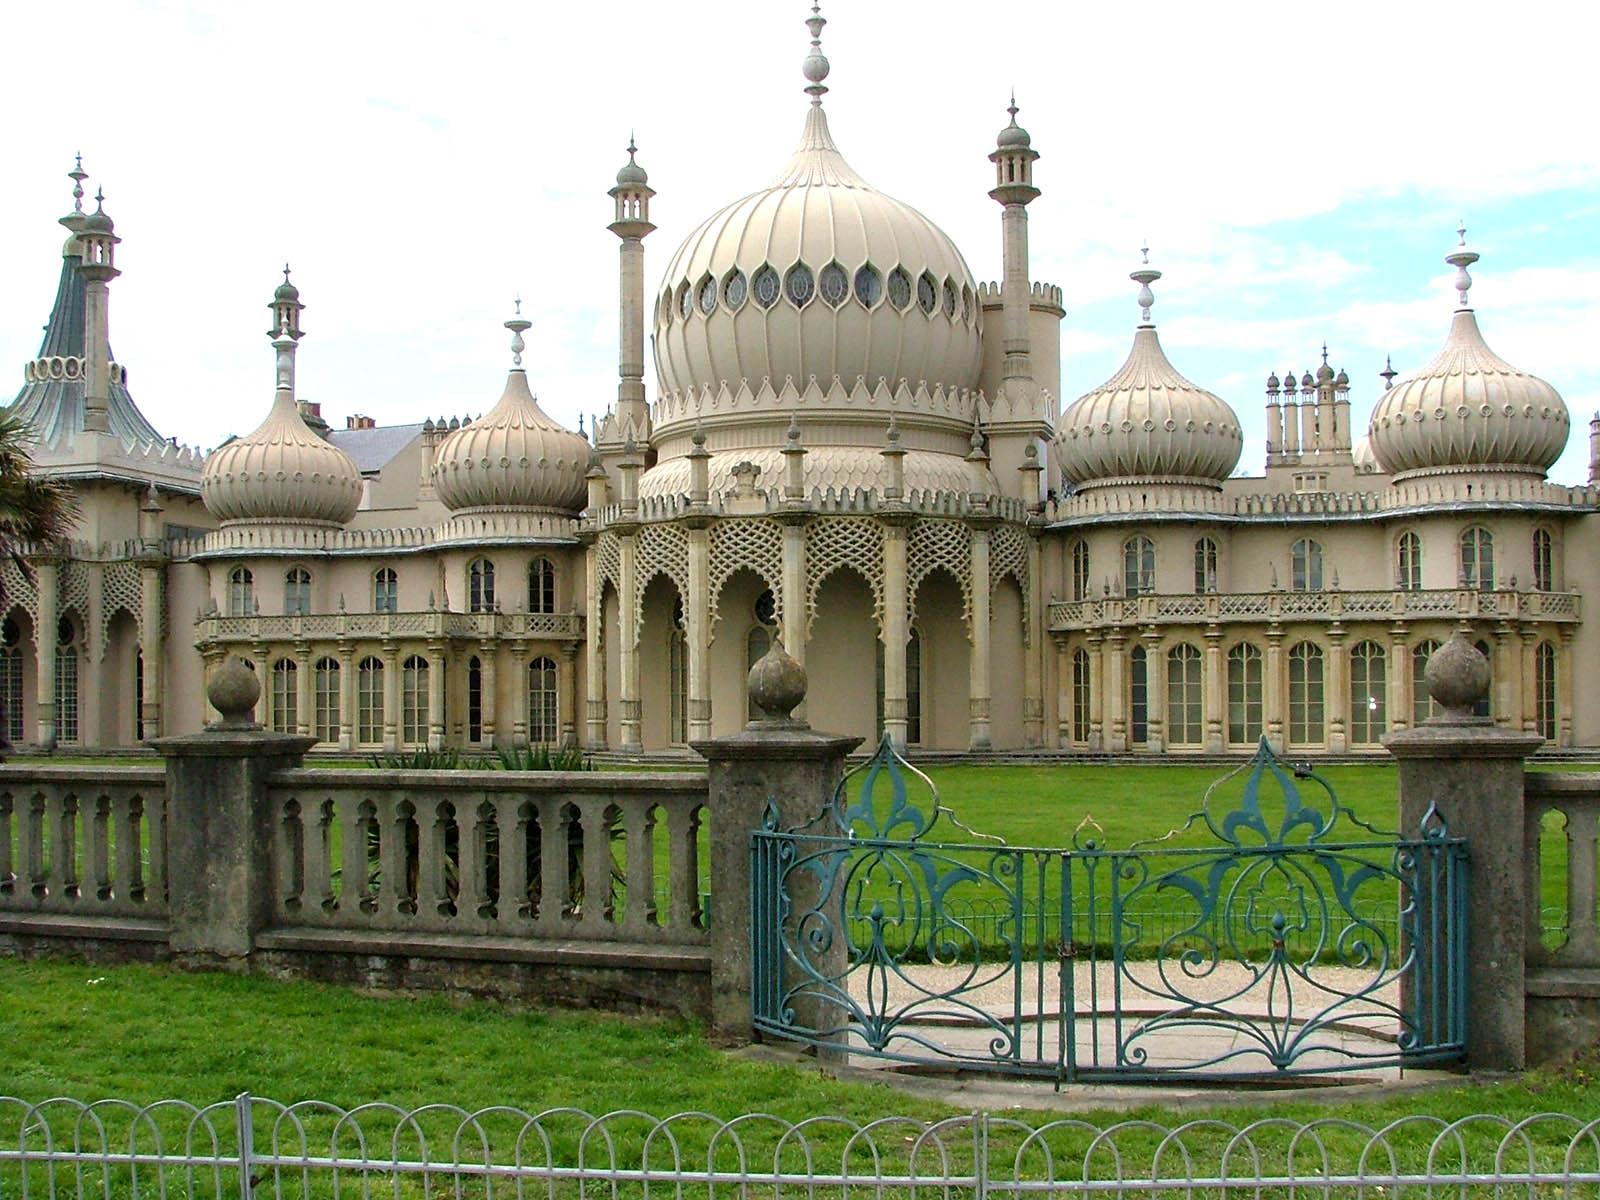 страны архитектура Королевский павильон Брайтон без смс